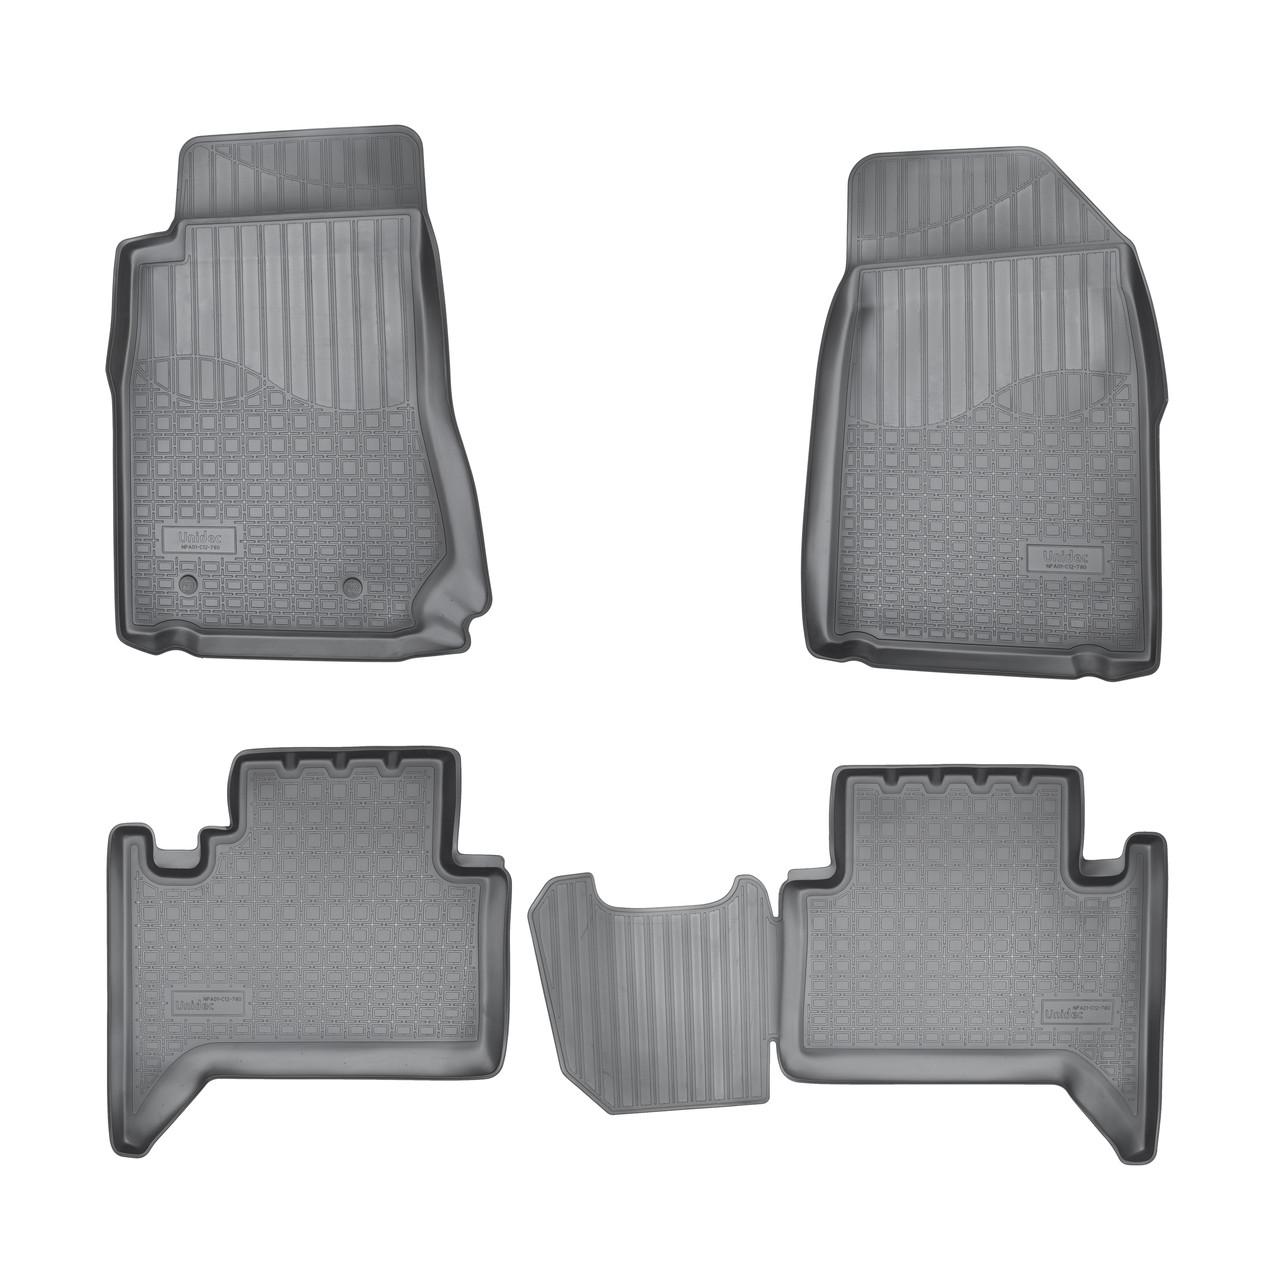 Коврики в салон Chevrolet Trail Blazer (2012-2021) 5 мест, GM 800